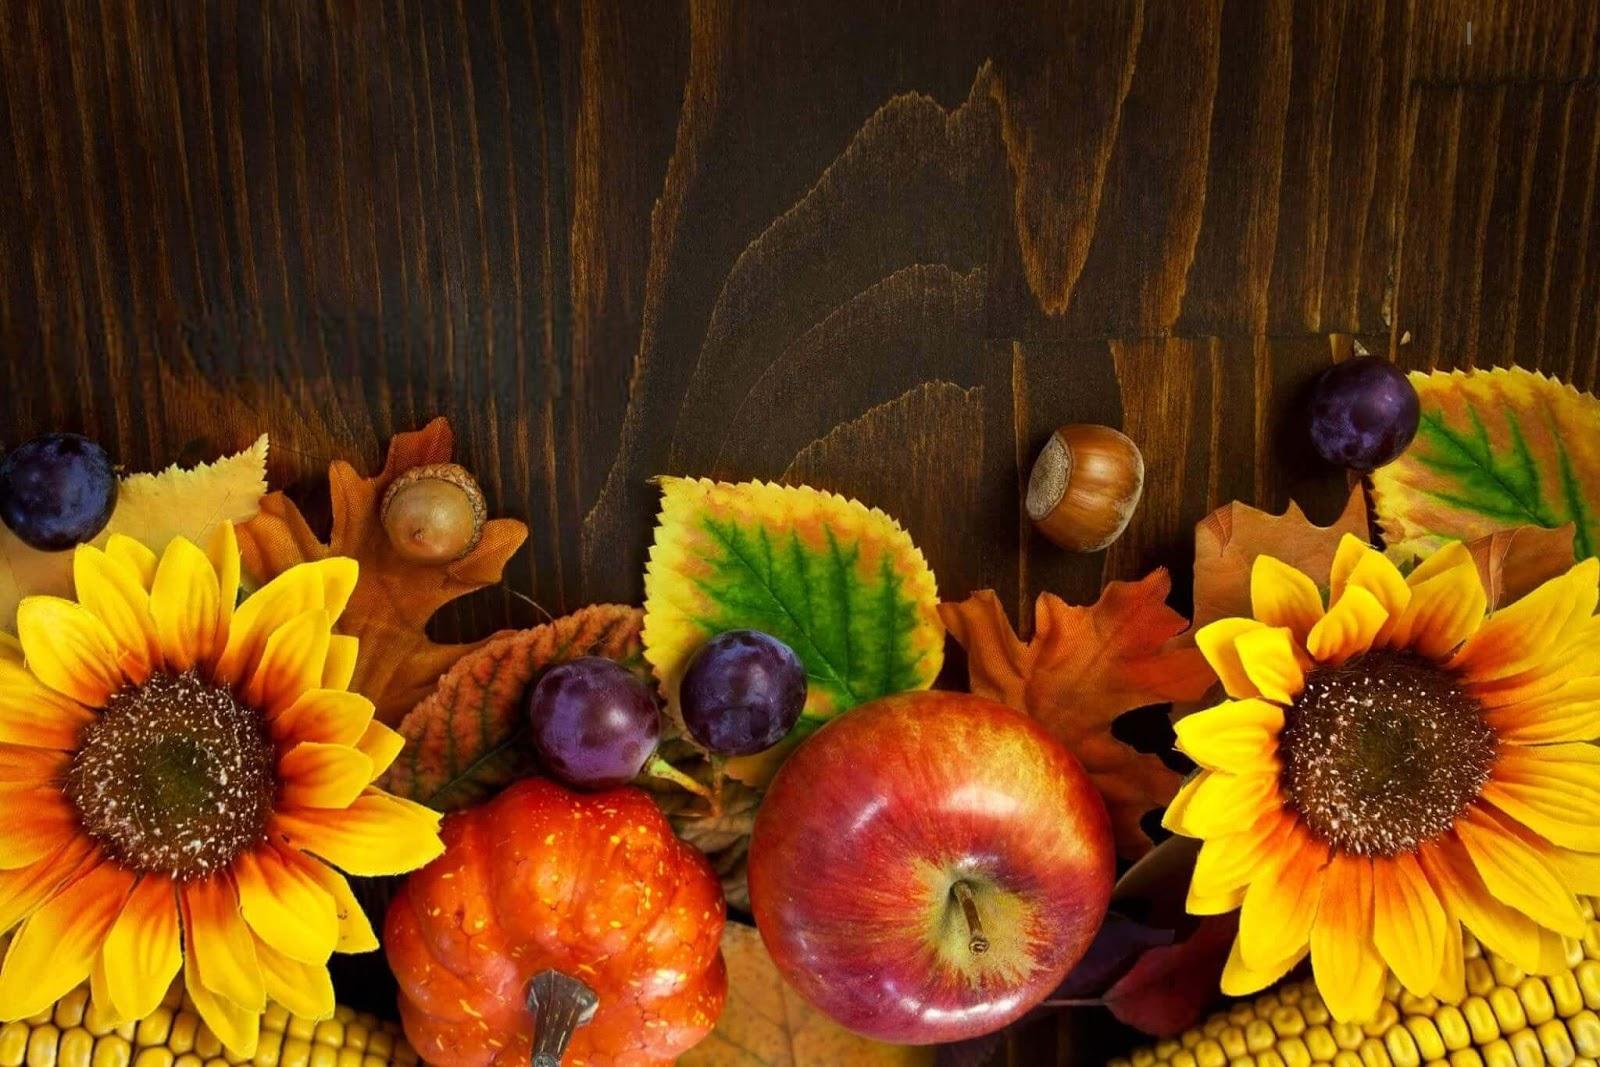 Thanksgiving Wallpaper, Thanksgiving Wallpaper HD